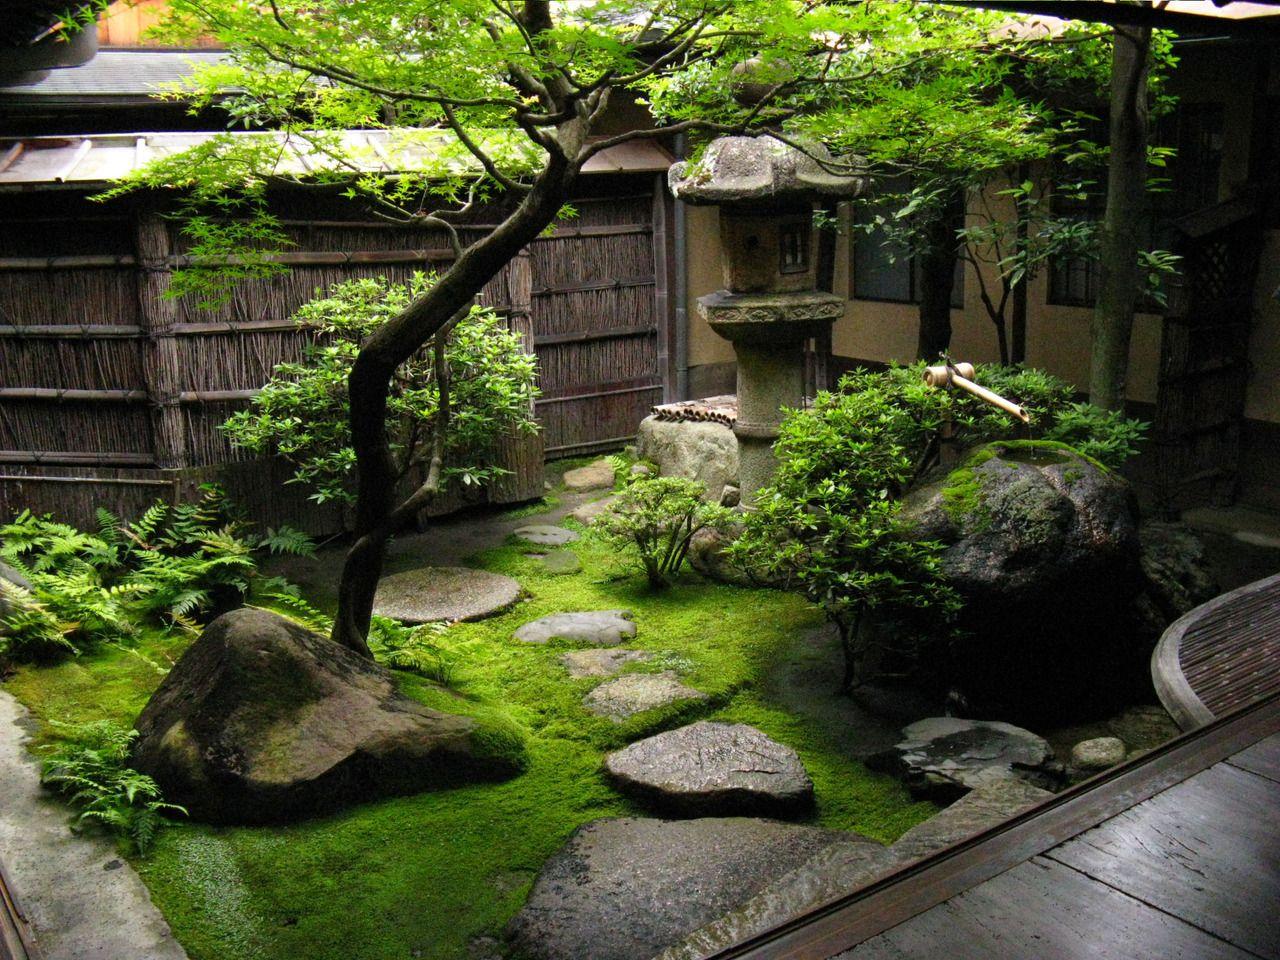 Japanese garden garden japan Garden design Pinterest